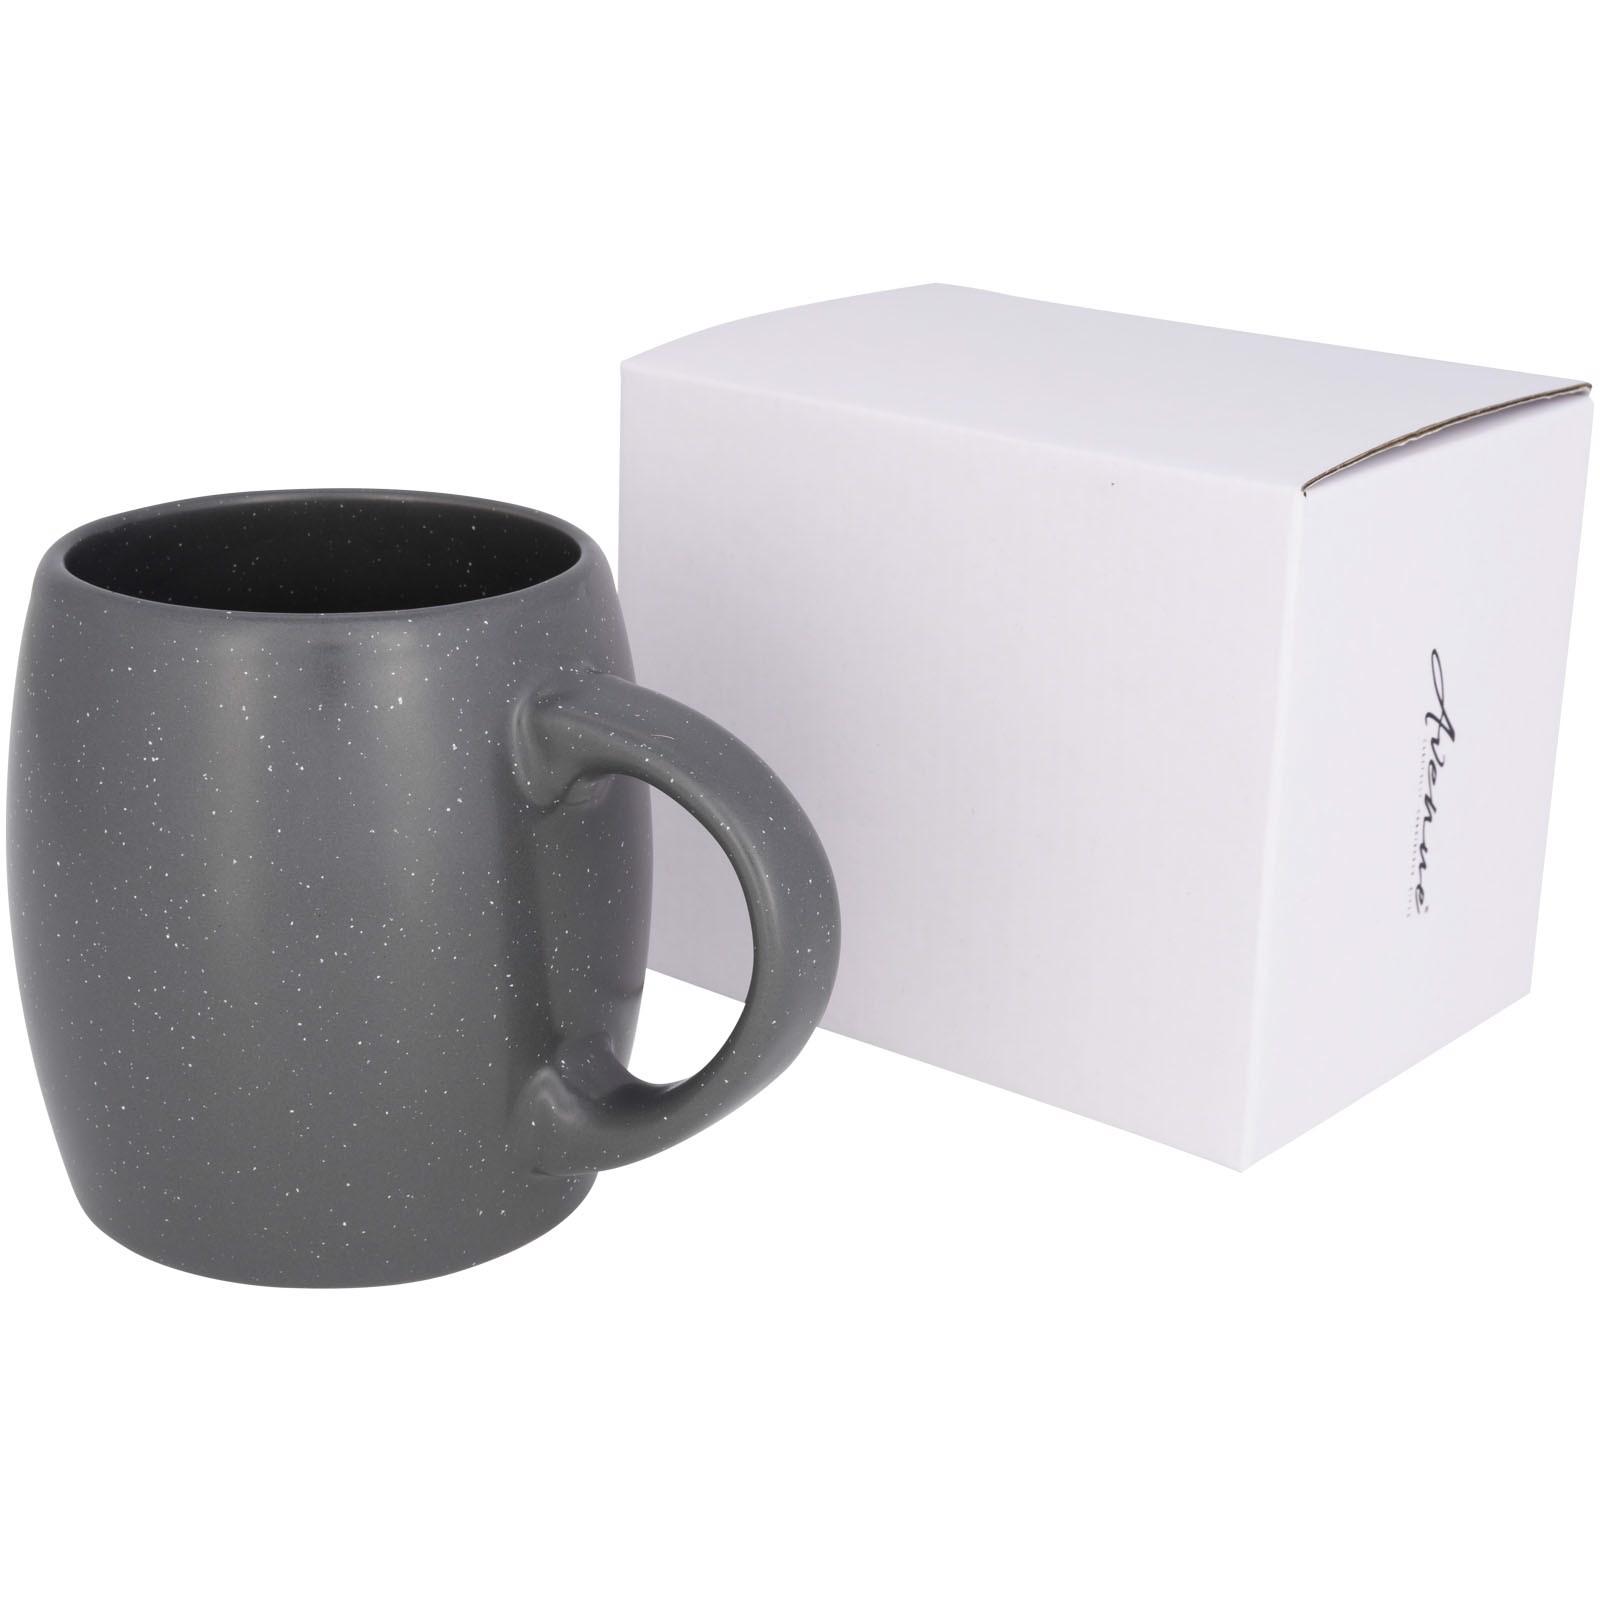 Stein 520 ml Keramiktasse - grau